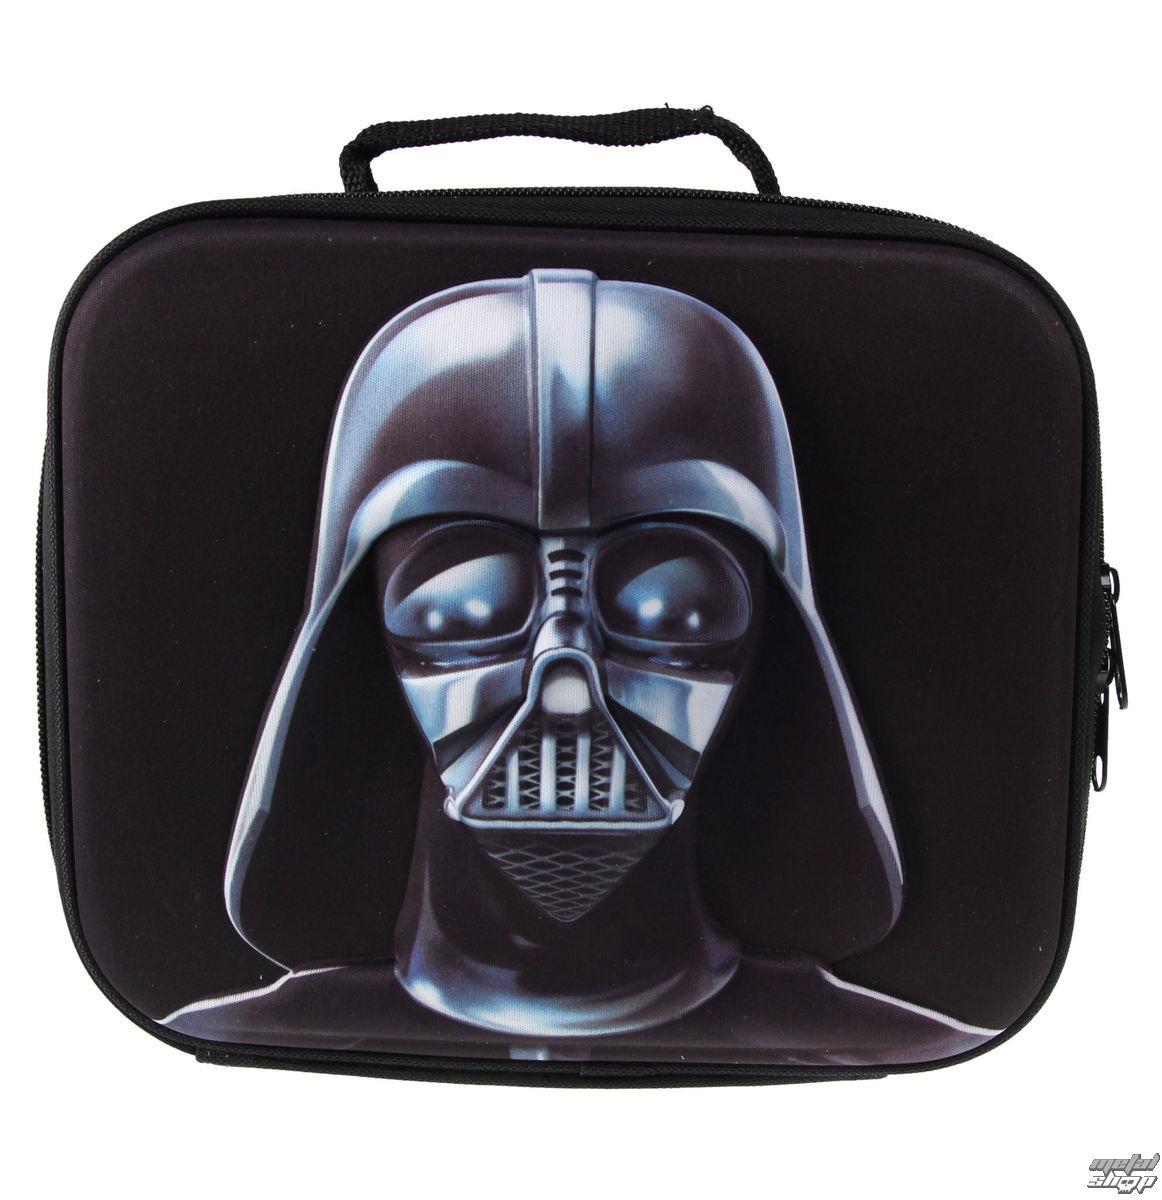 pouzdro na svačinu STAR WARS - 3D Darth Vader - CRD2100000210